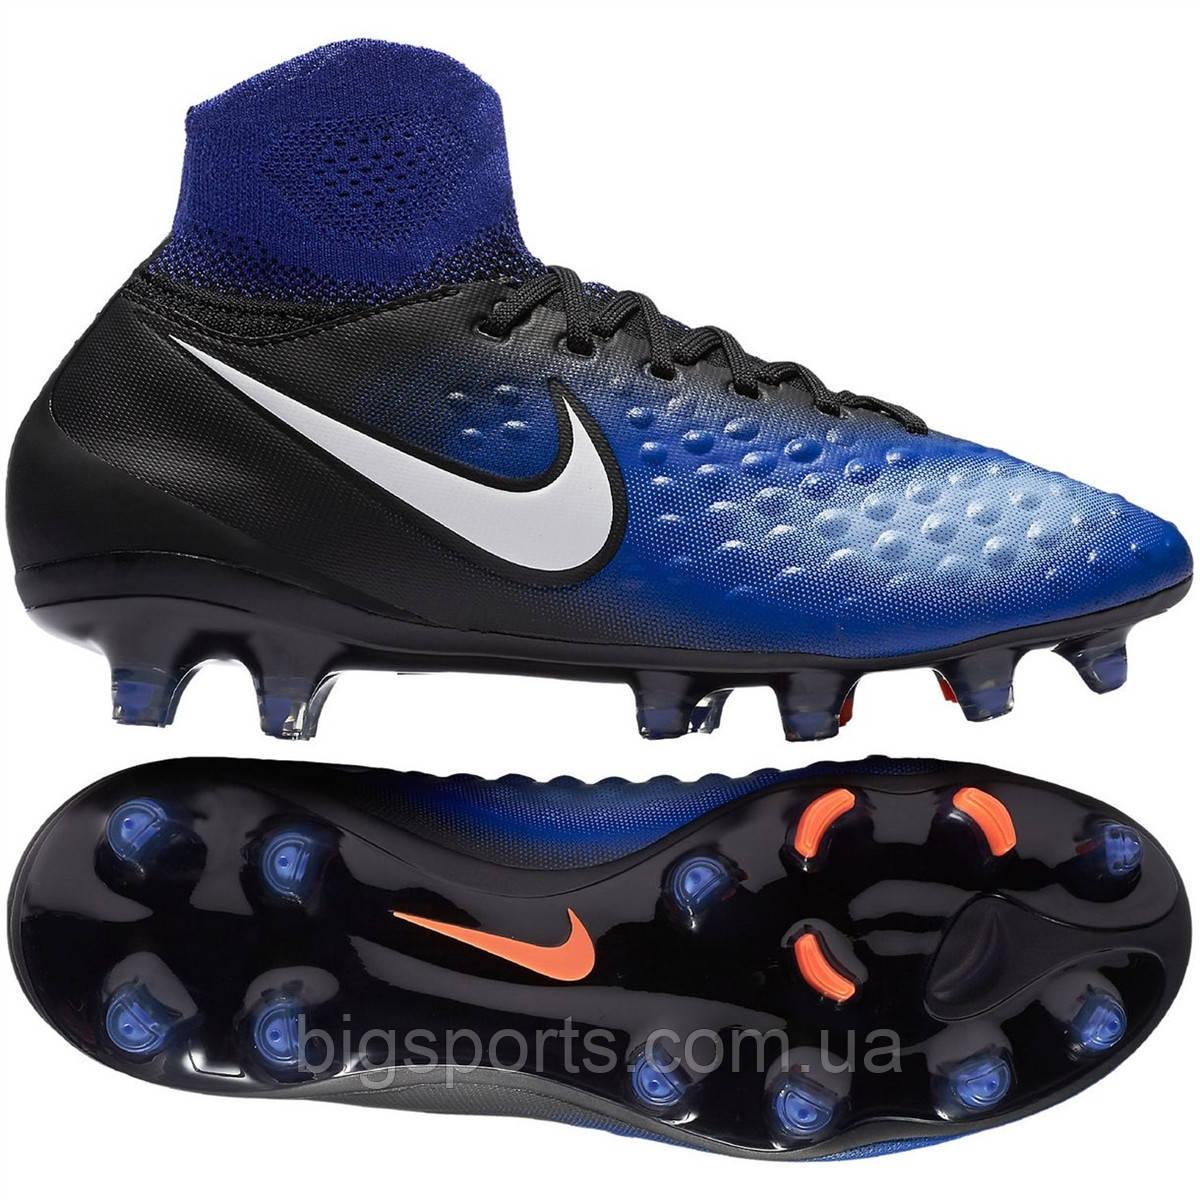 d953ac8b1a06 Бутсы дет. Nike JR Magista Obra II FG (арт. 844410-015), цена 1 600 ...